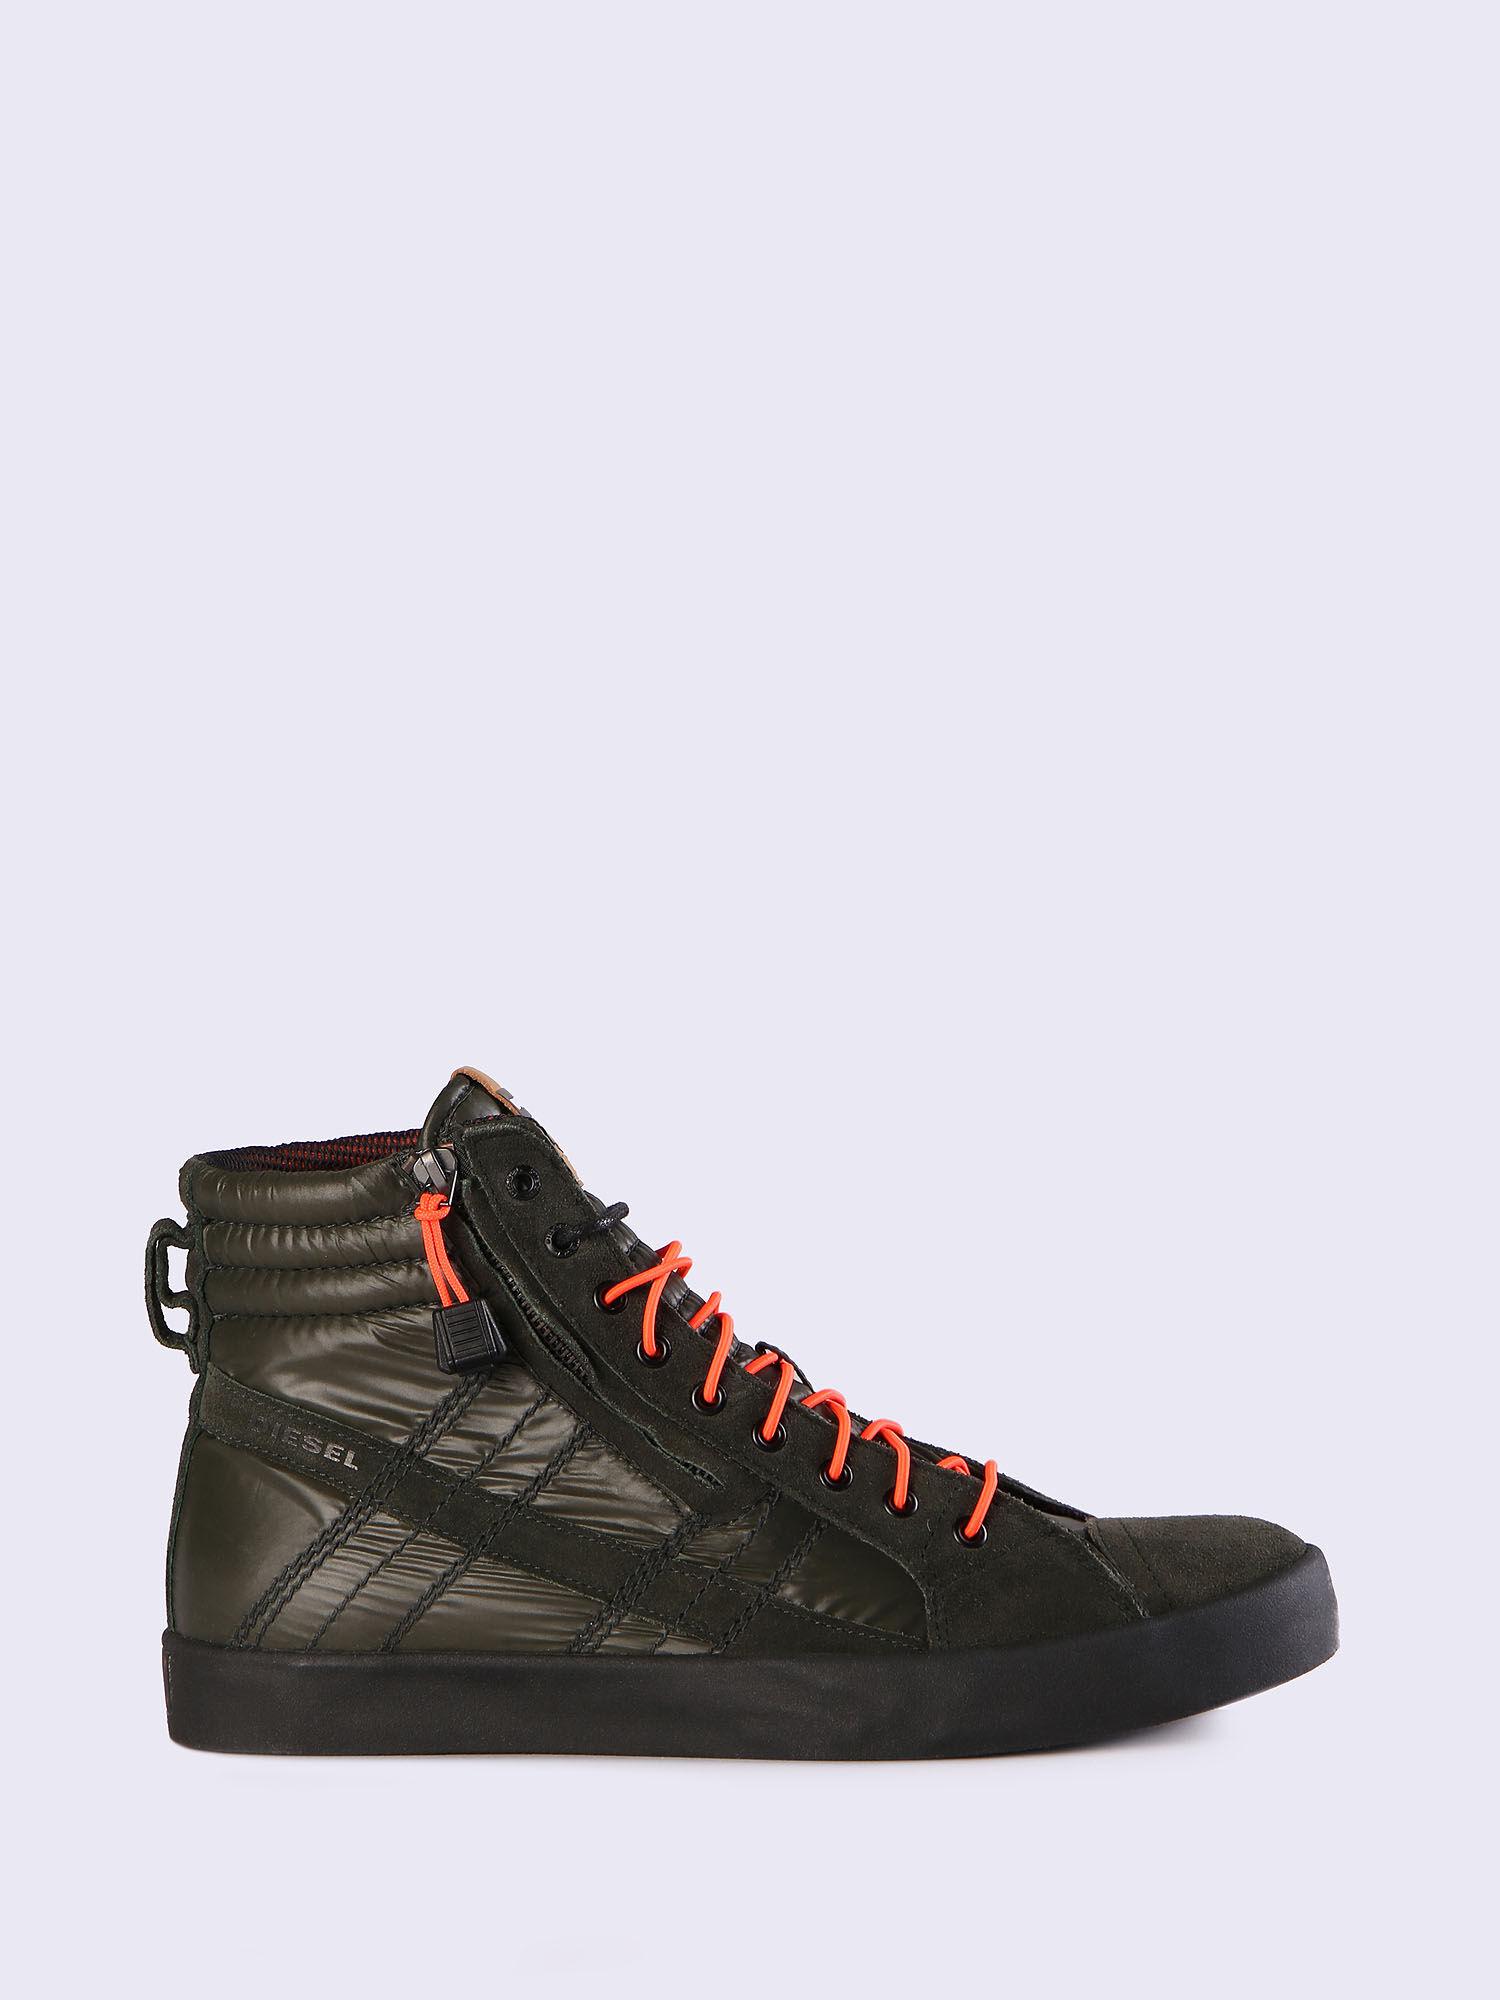 Chaussures De Sport Haut Noir Habillés Diesel Diesel lcbMTfli